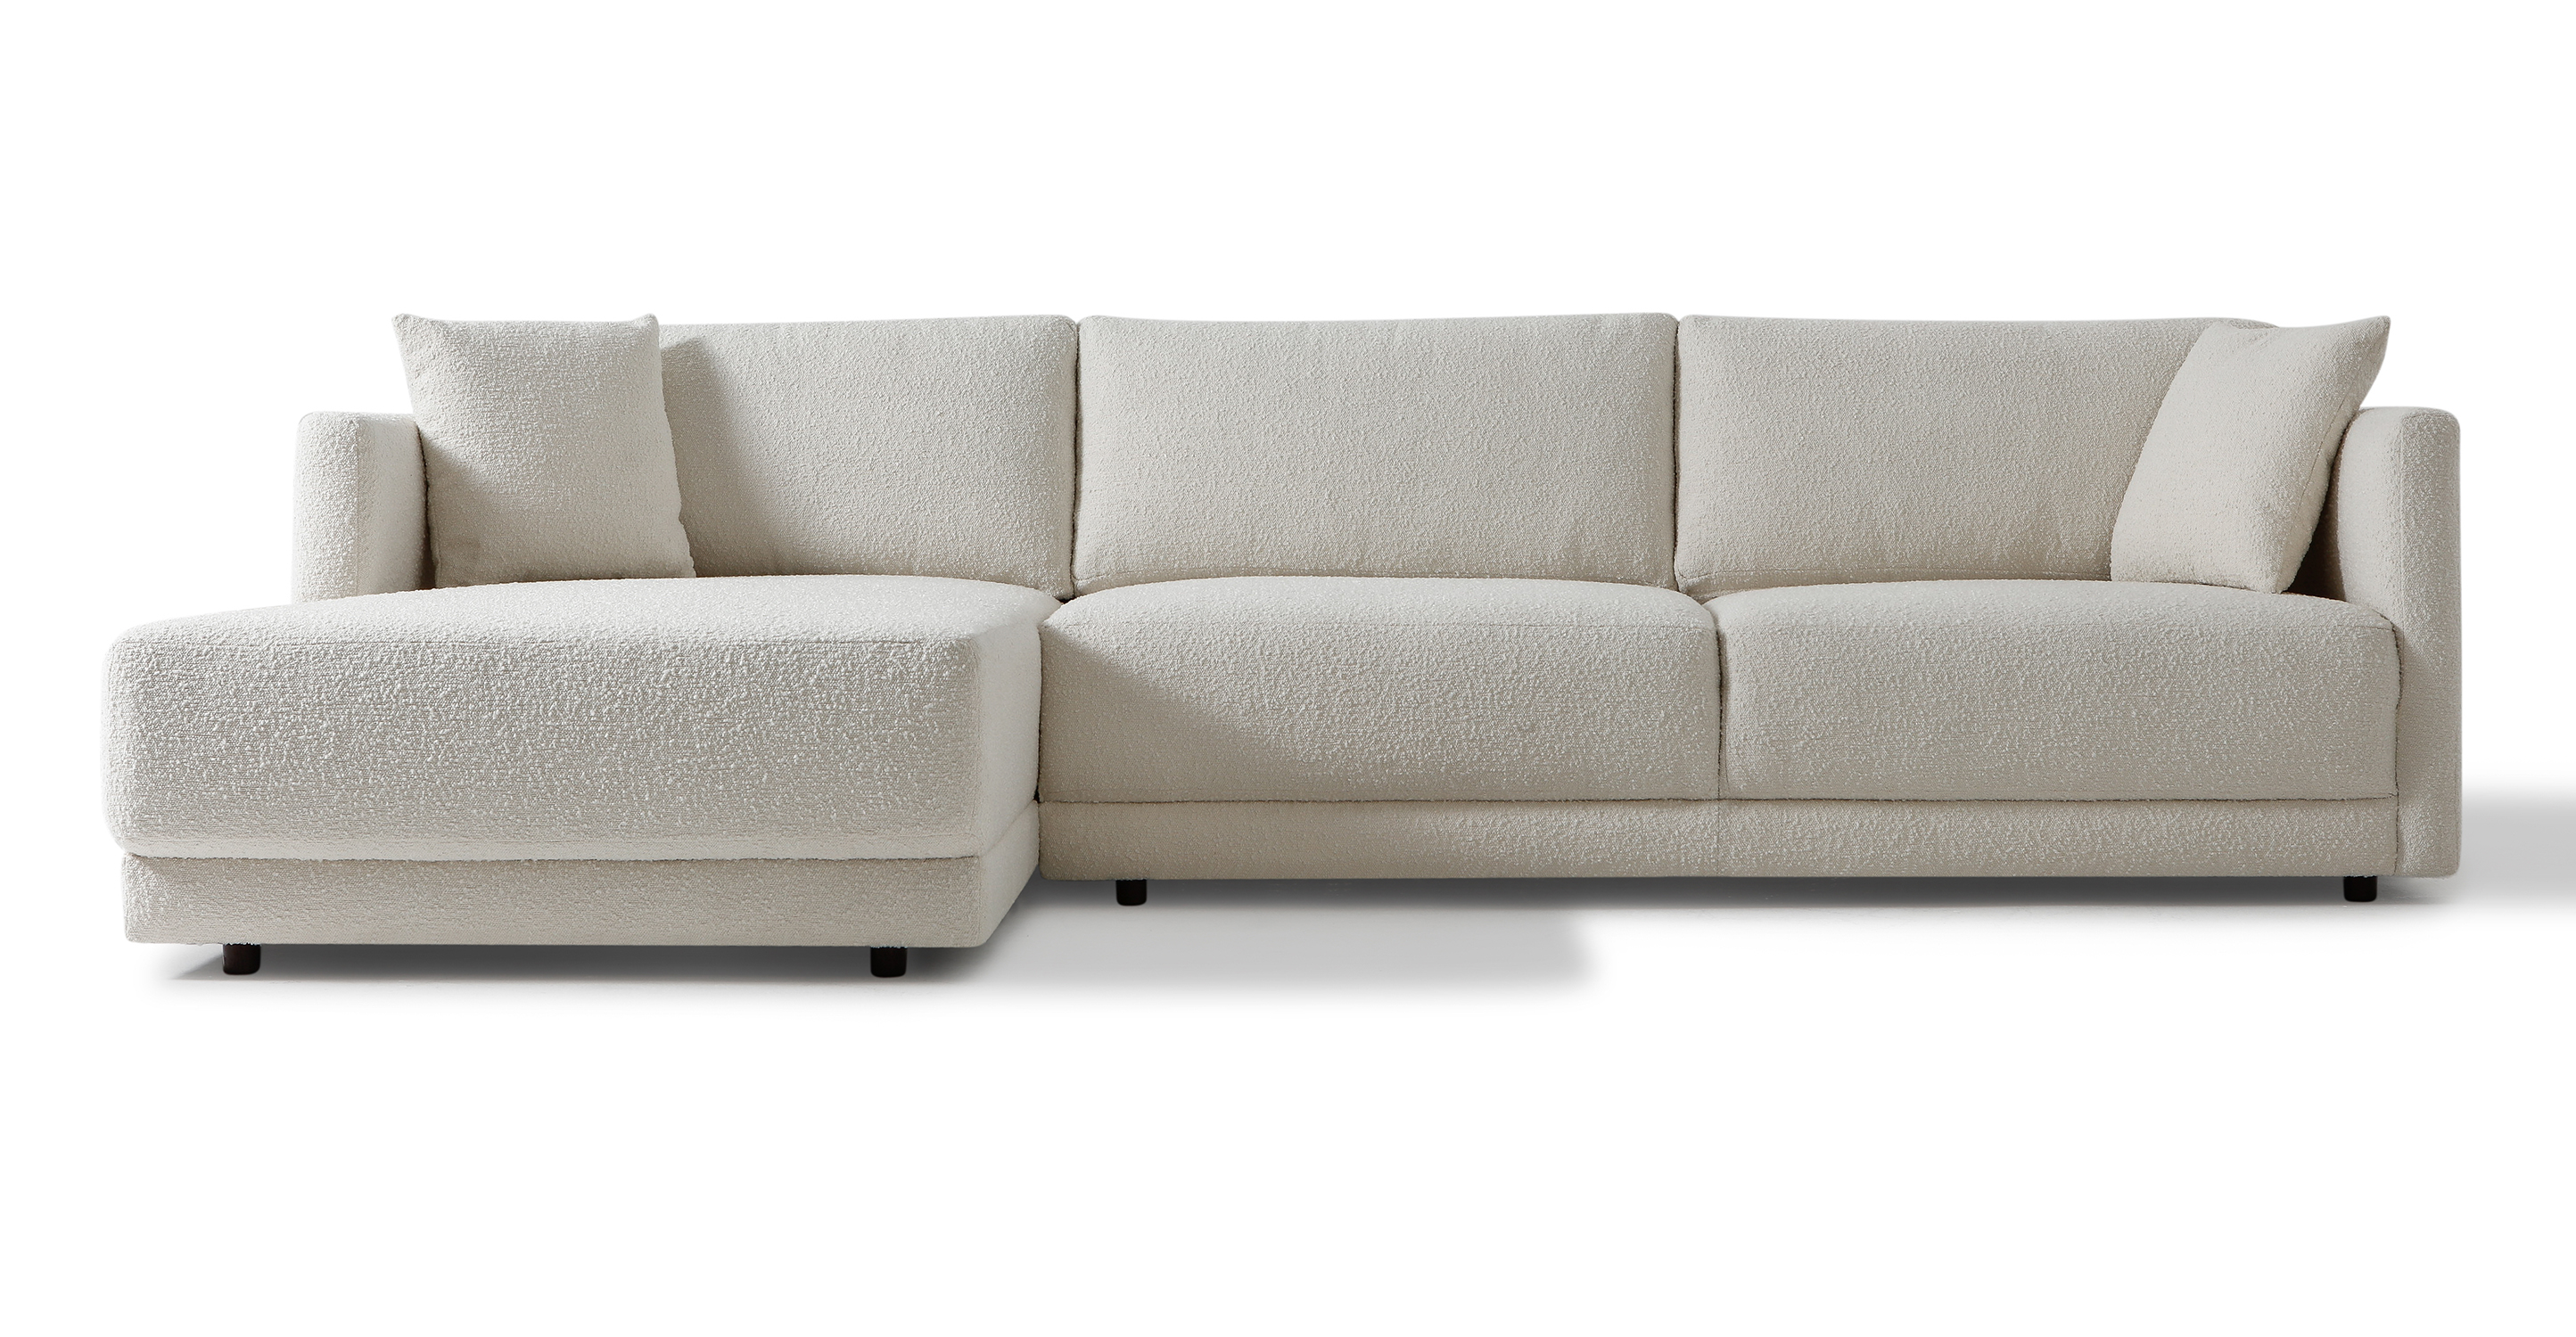 "Domus 115"" Sofa Sectional Left, Blanc Boucle"